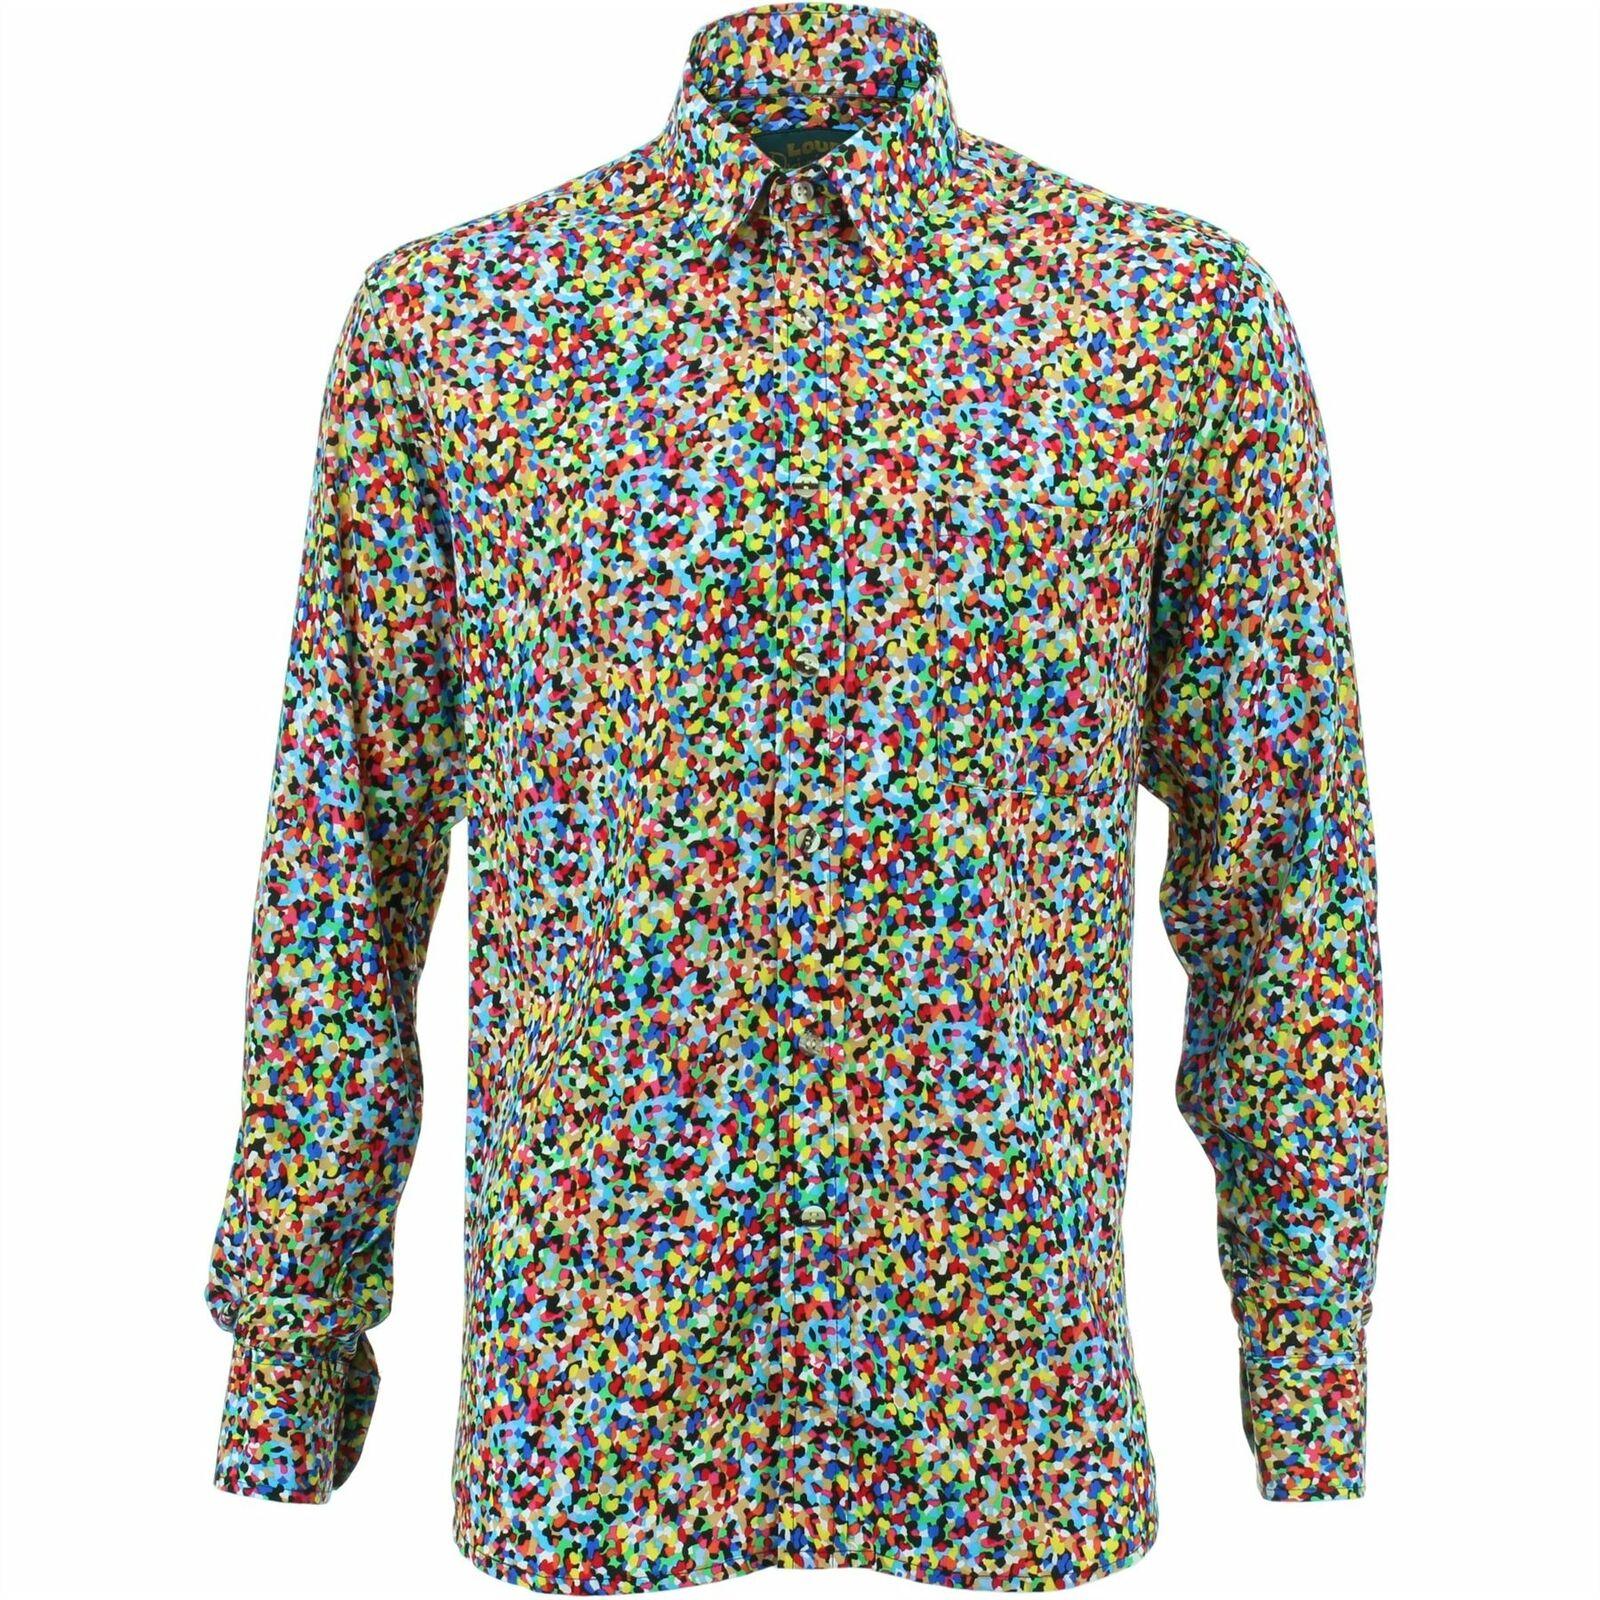 Mens Shirt Loud Originals REGULAR FIT Abstract Multi Retro Psychedelic Fancy